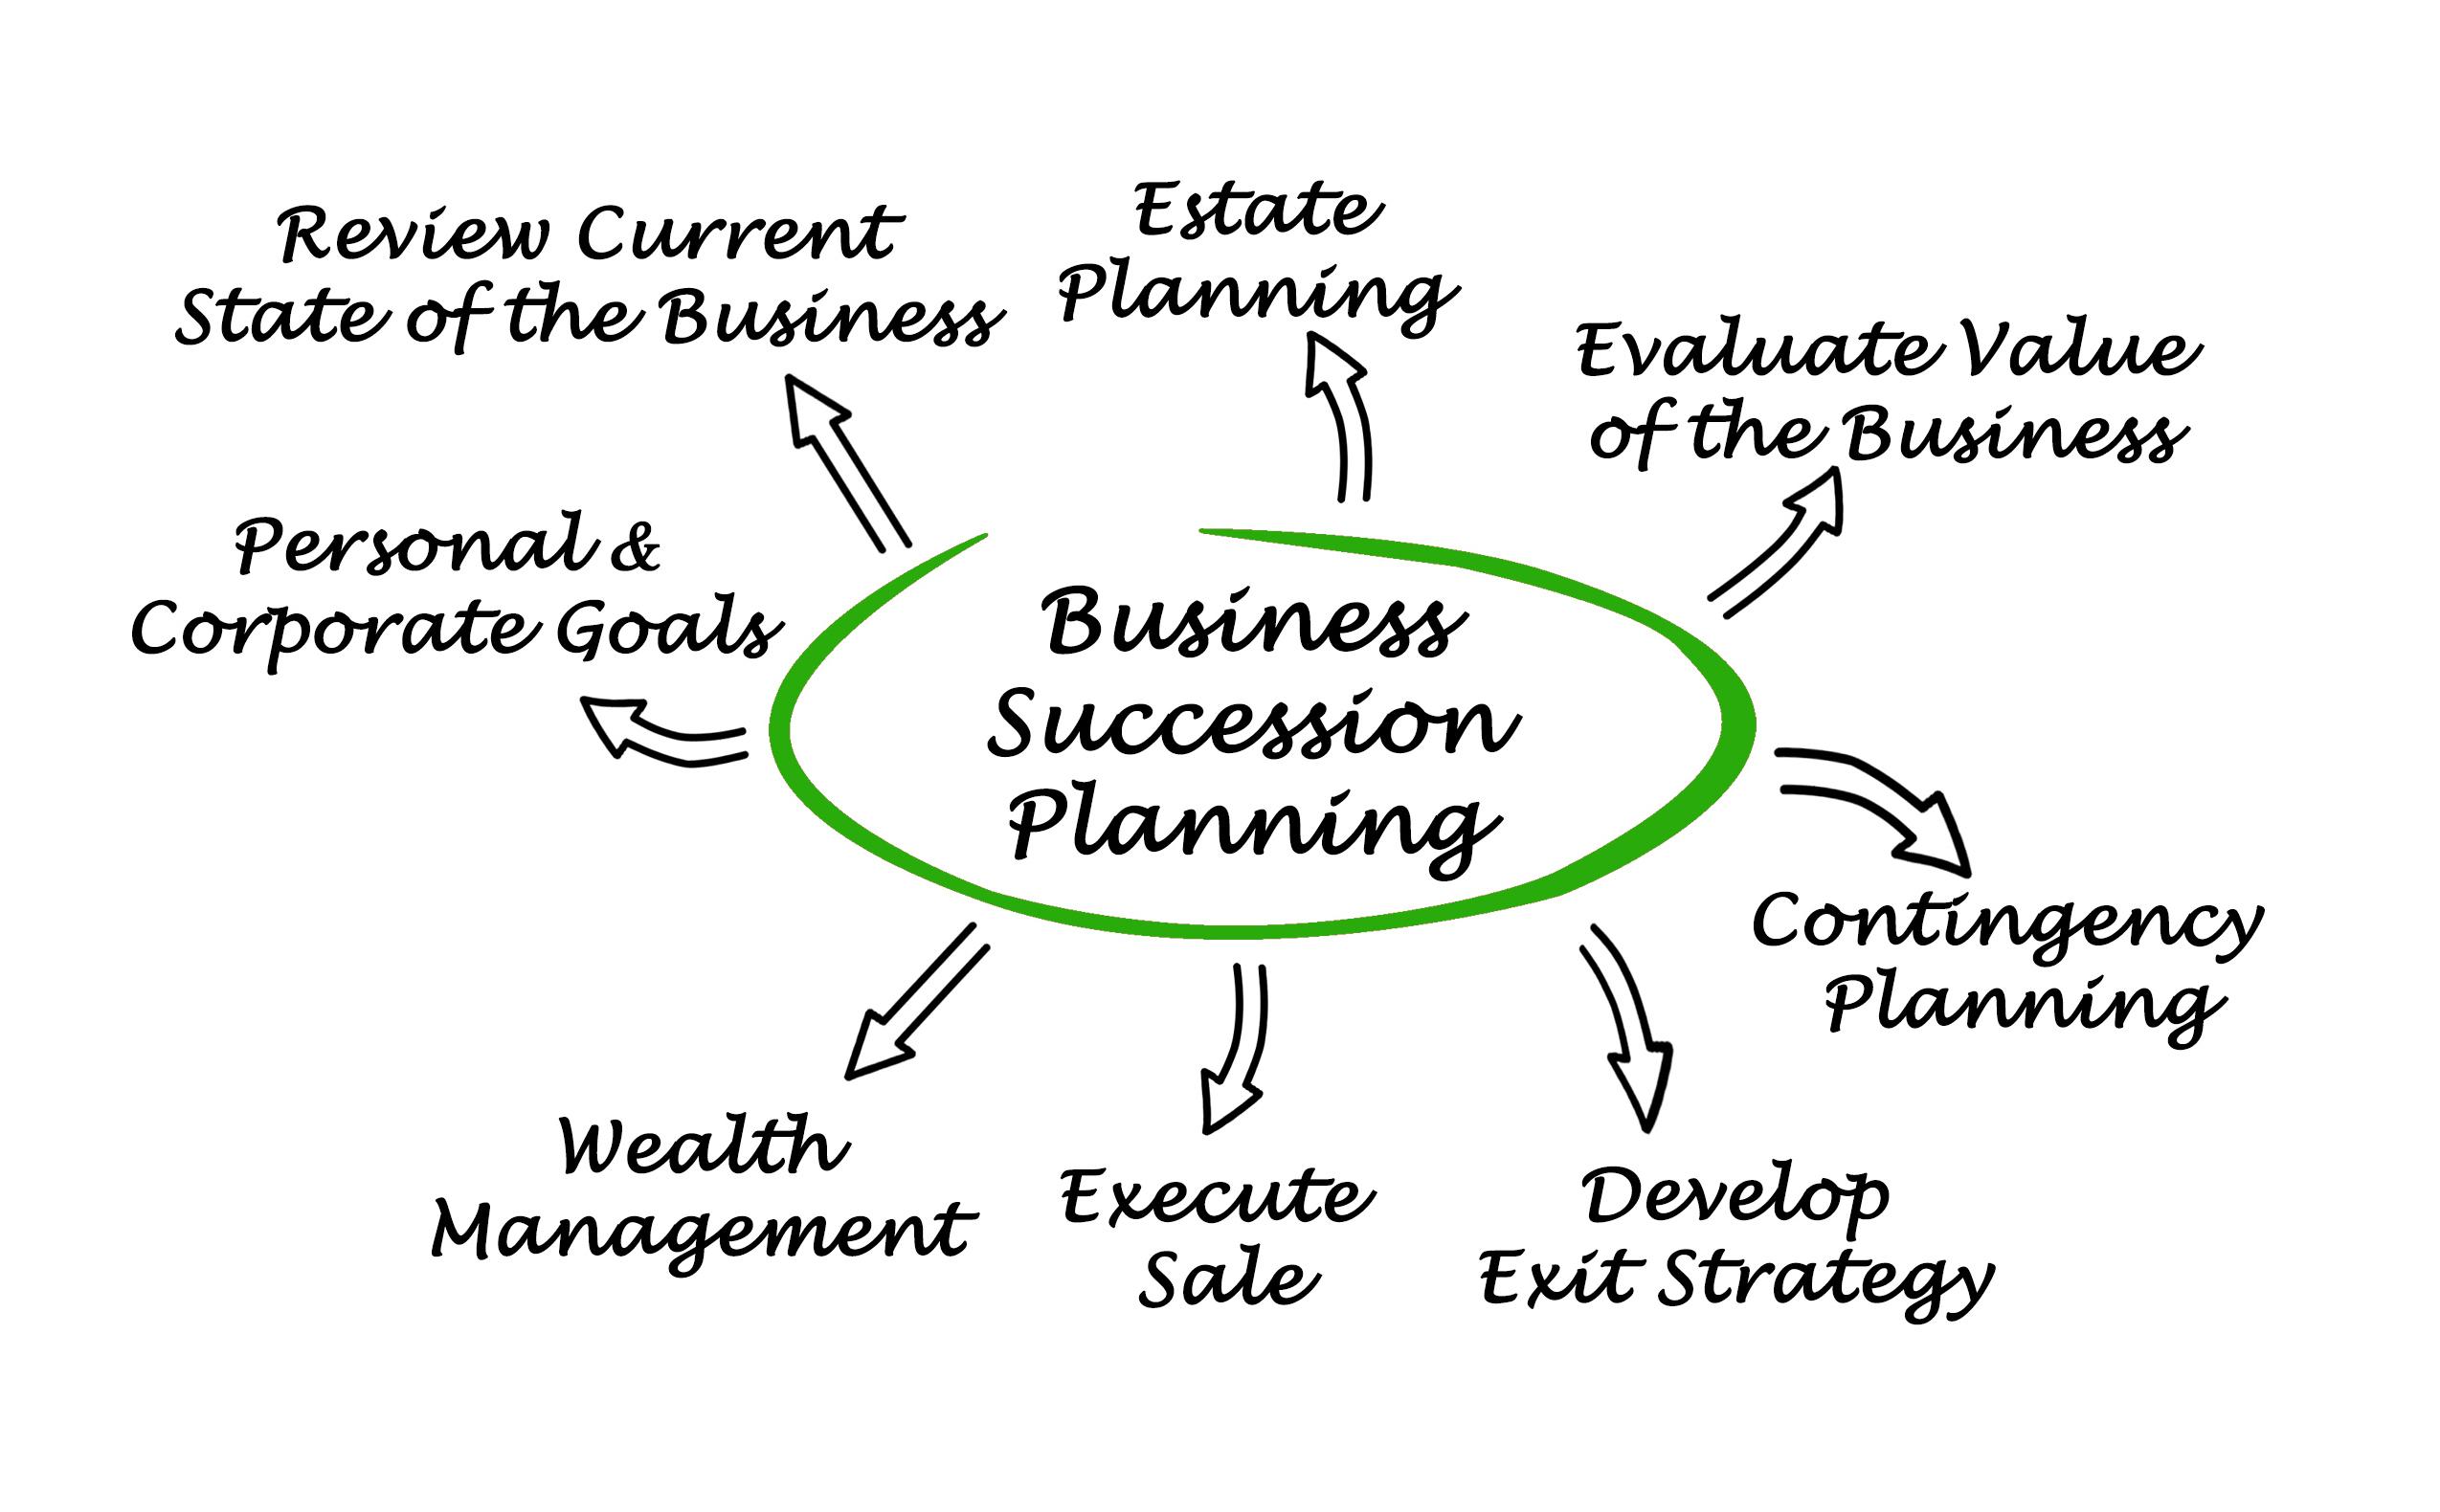 siness Succession Planning Venn Diagram